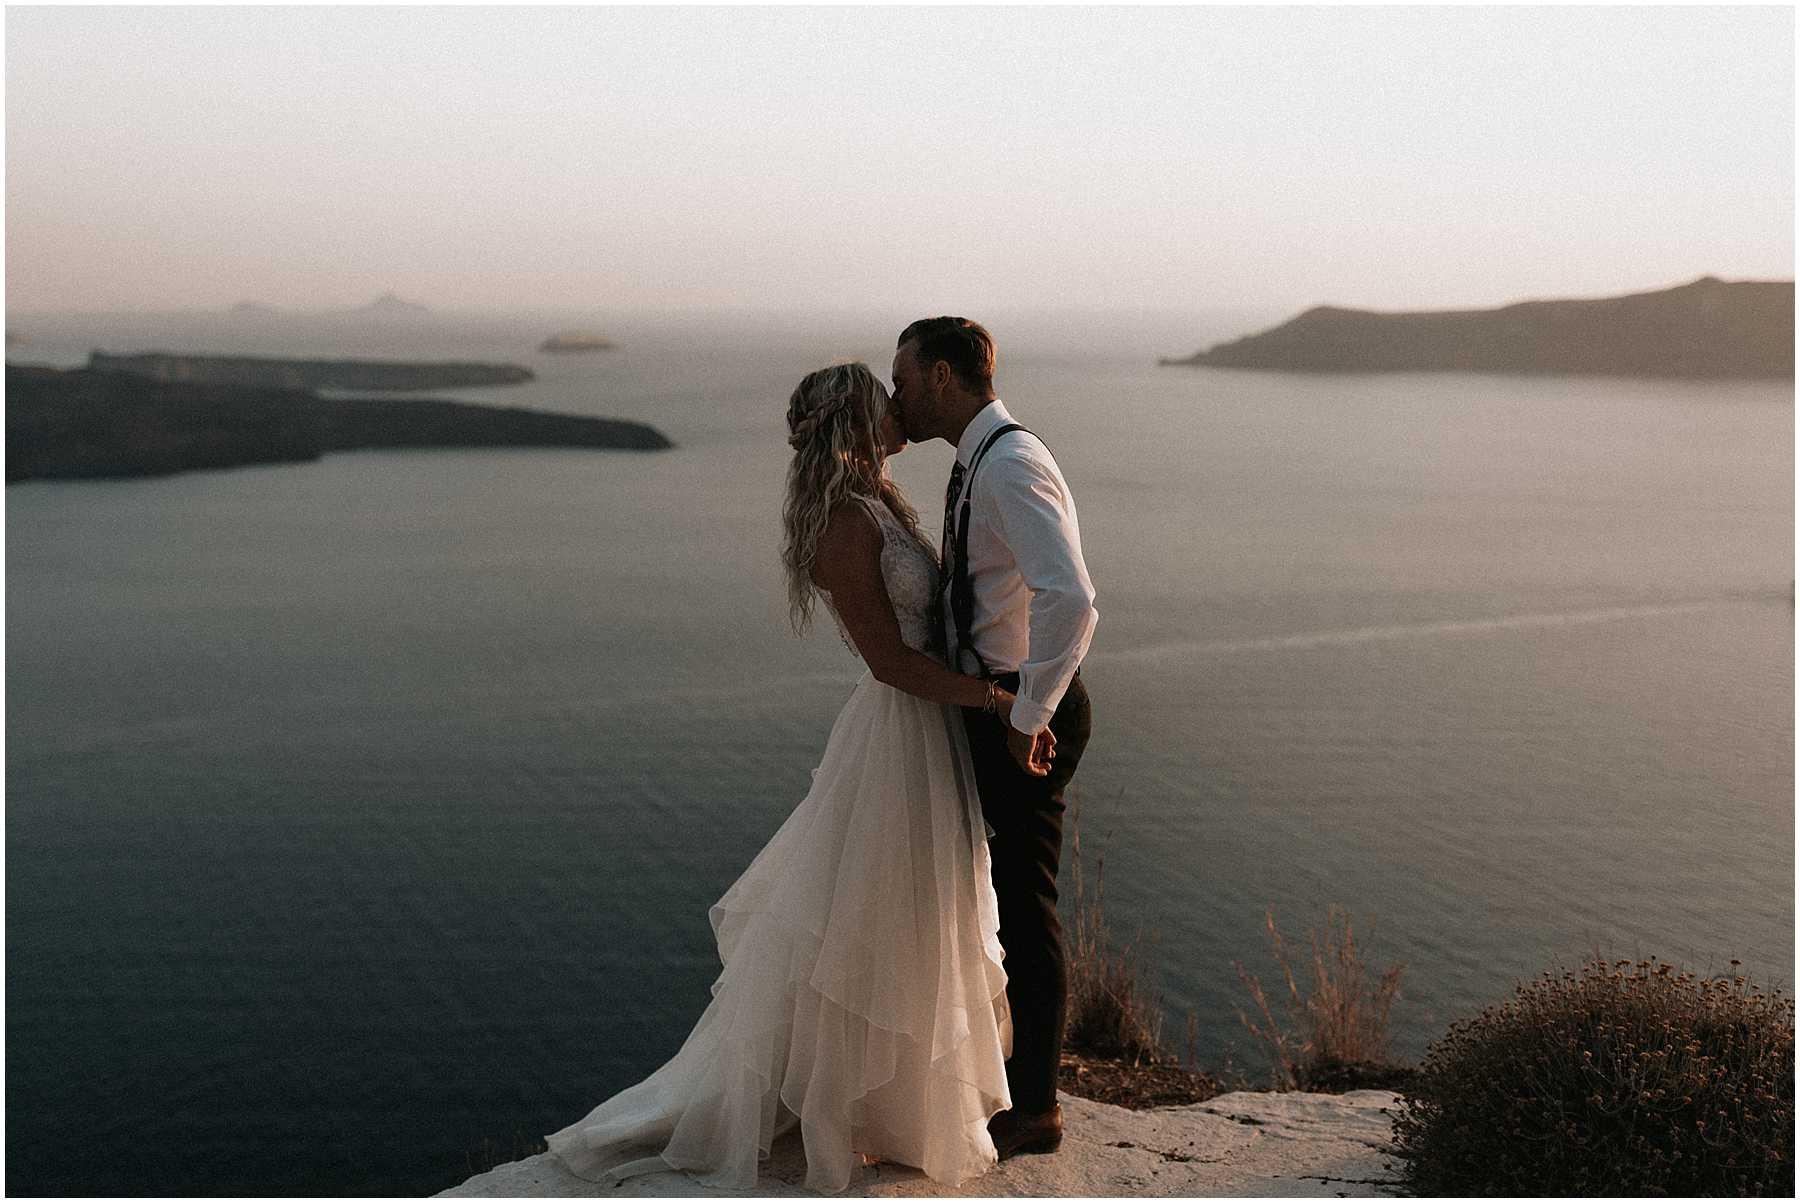 A bride and groom elope in Santorini